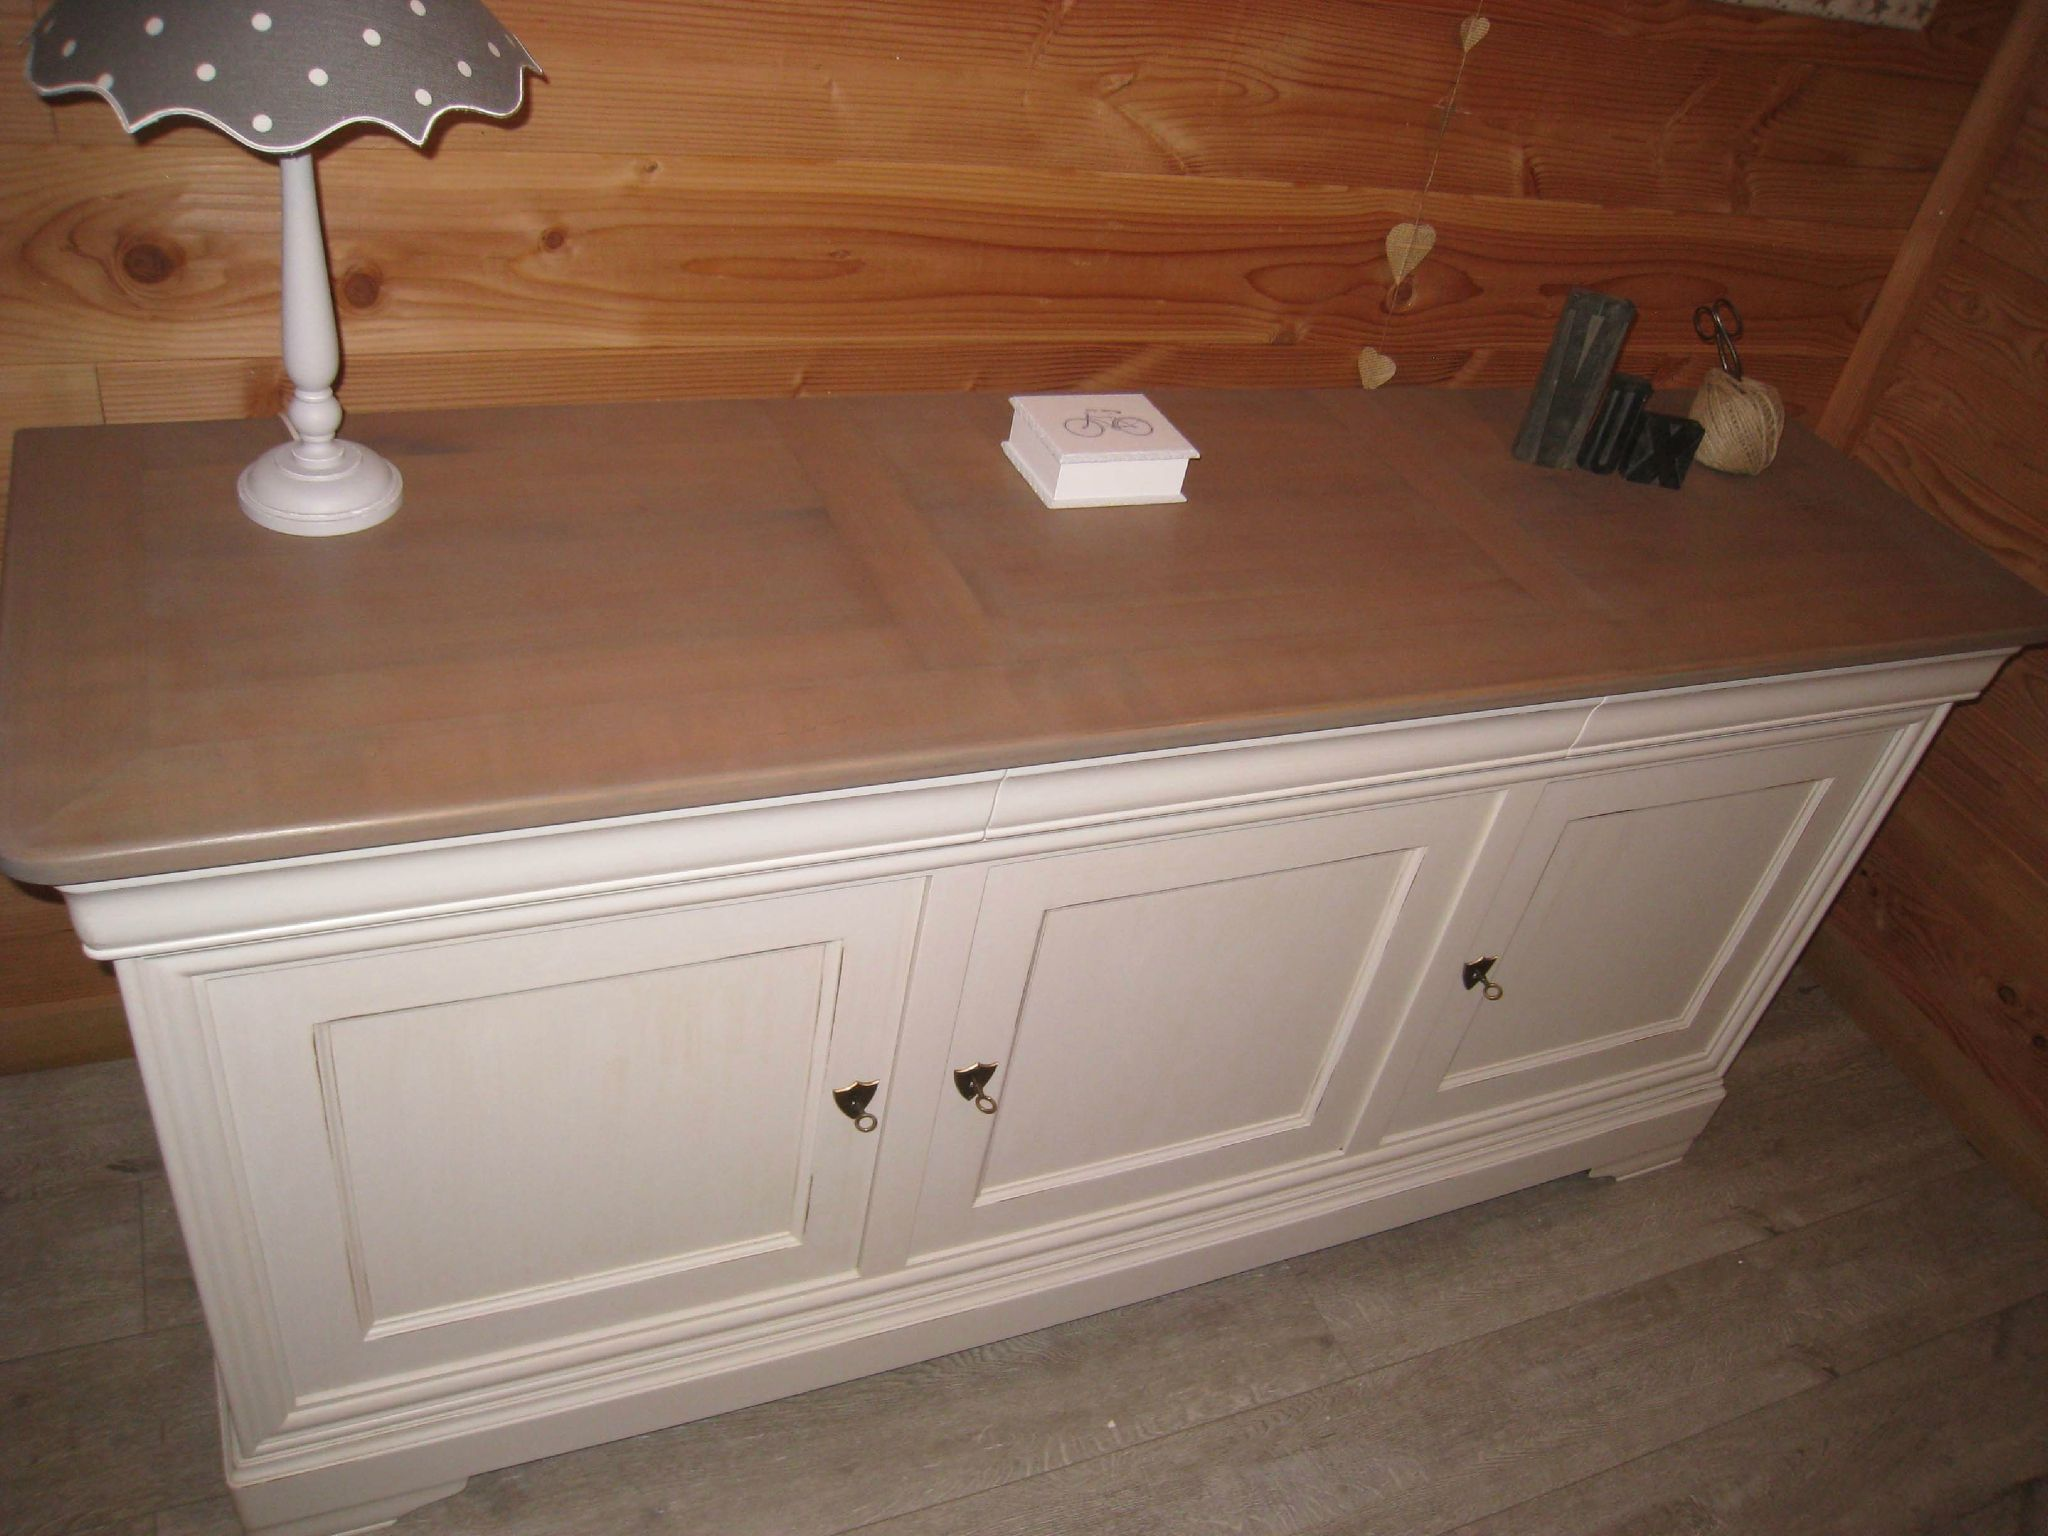 buffet louis philippe relook dessus huil decoration pinterest relooker mobilier de. Black Bedroom Furniture Sets. Home Design Ideas